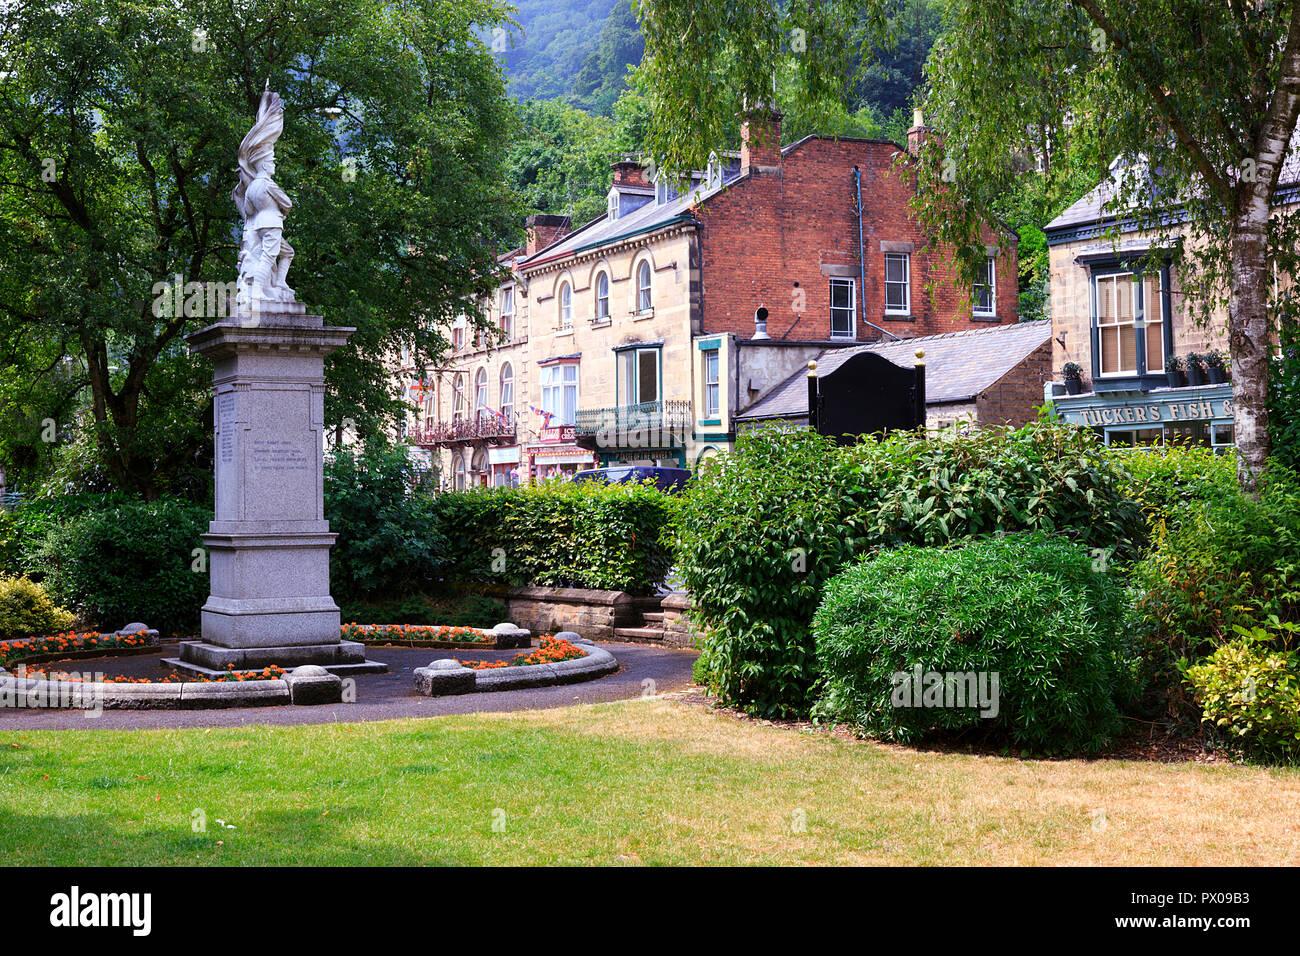 War Memorial & gardens in Matlock Bath Derbyshire - Stock Image